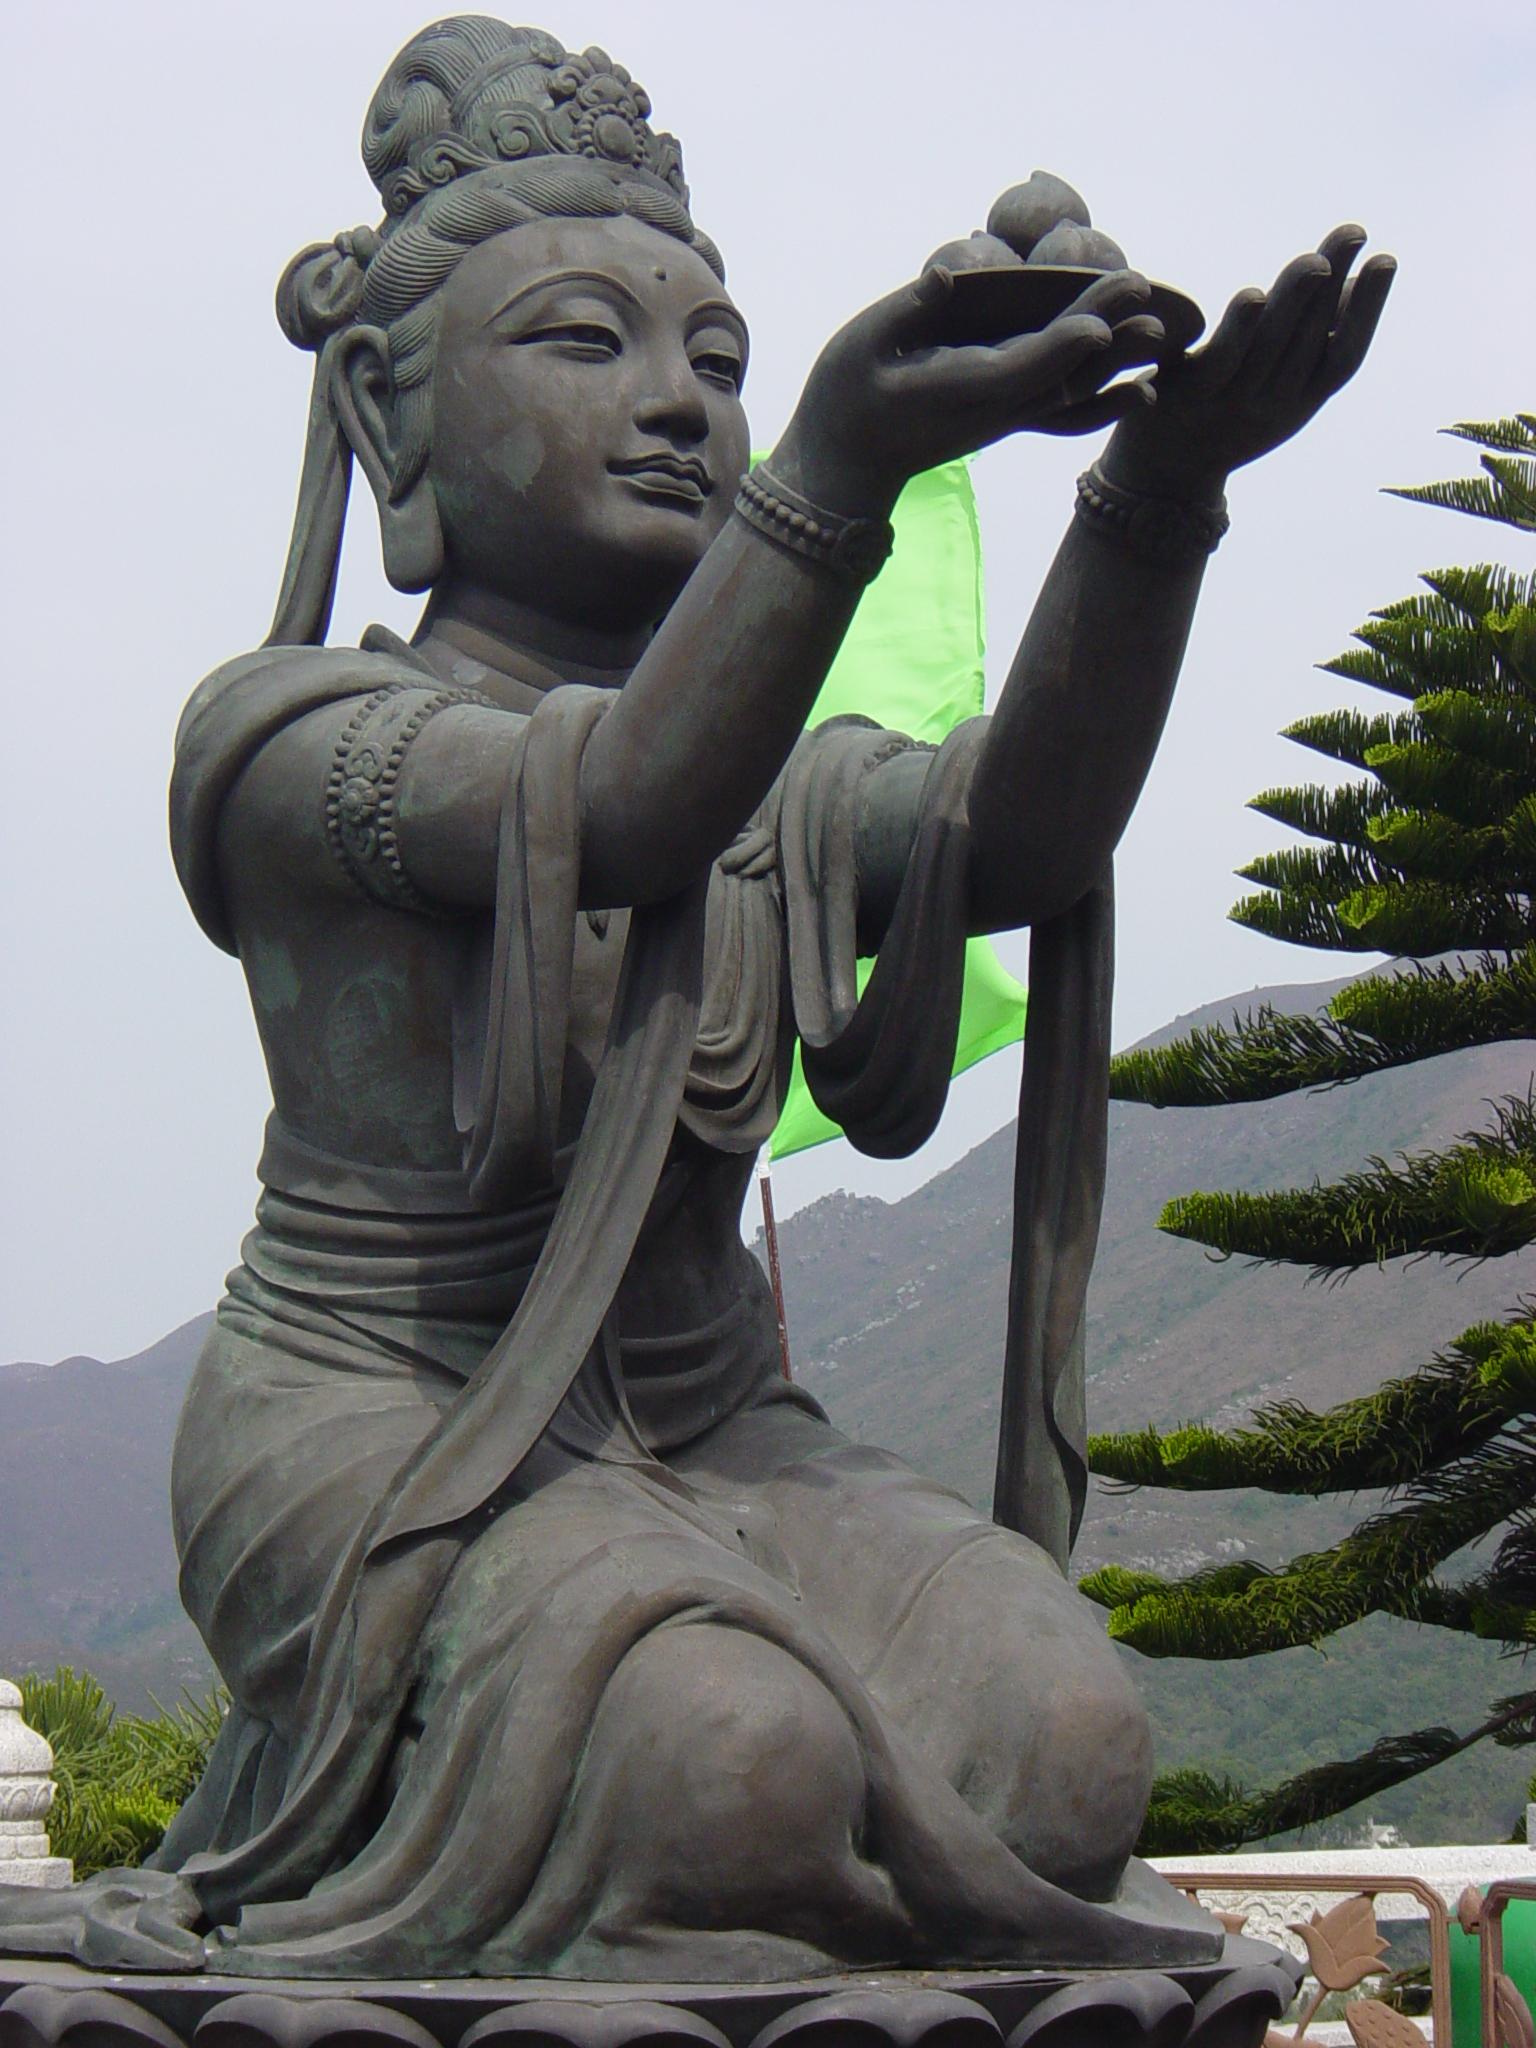 Bodhisattva-On the way of Buddha...